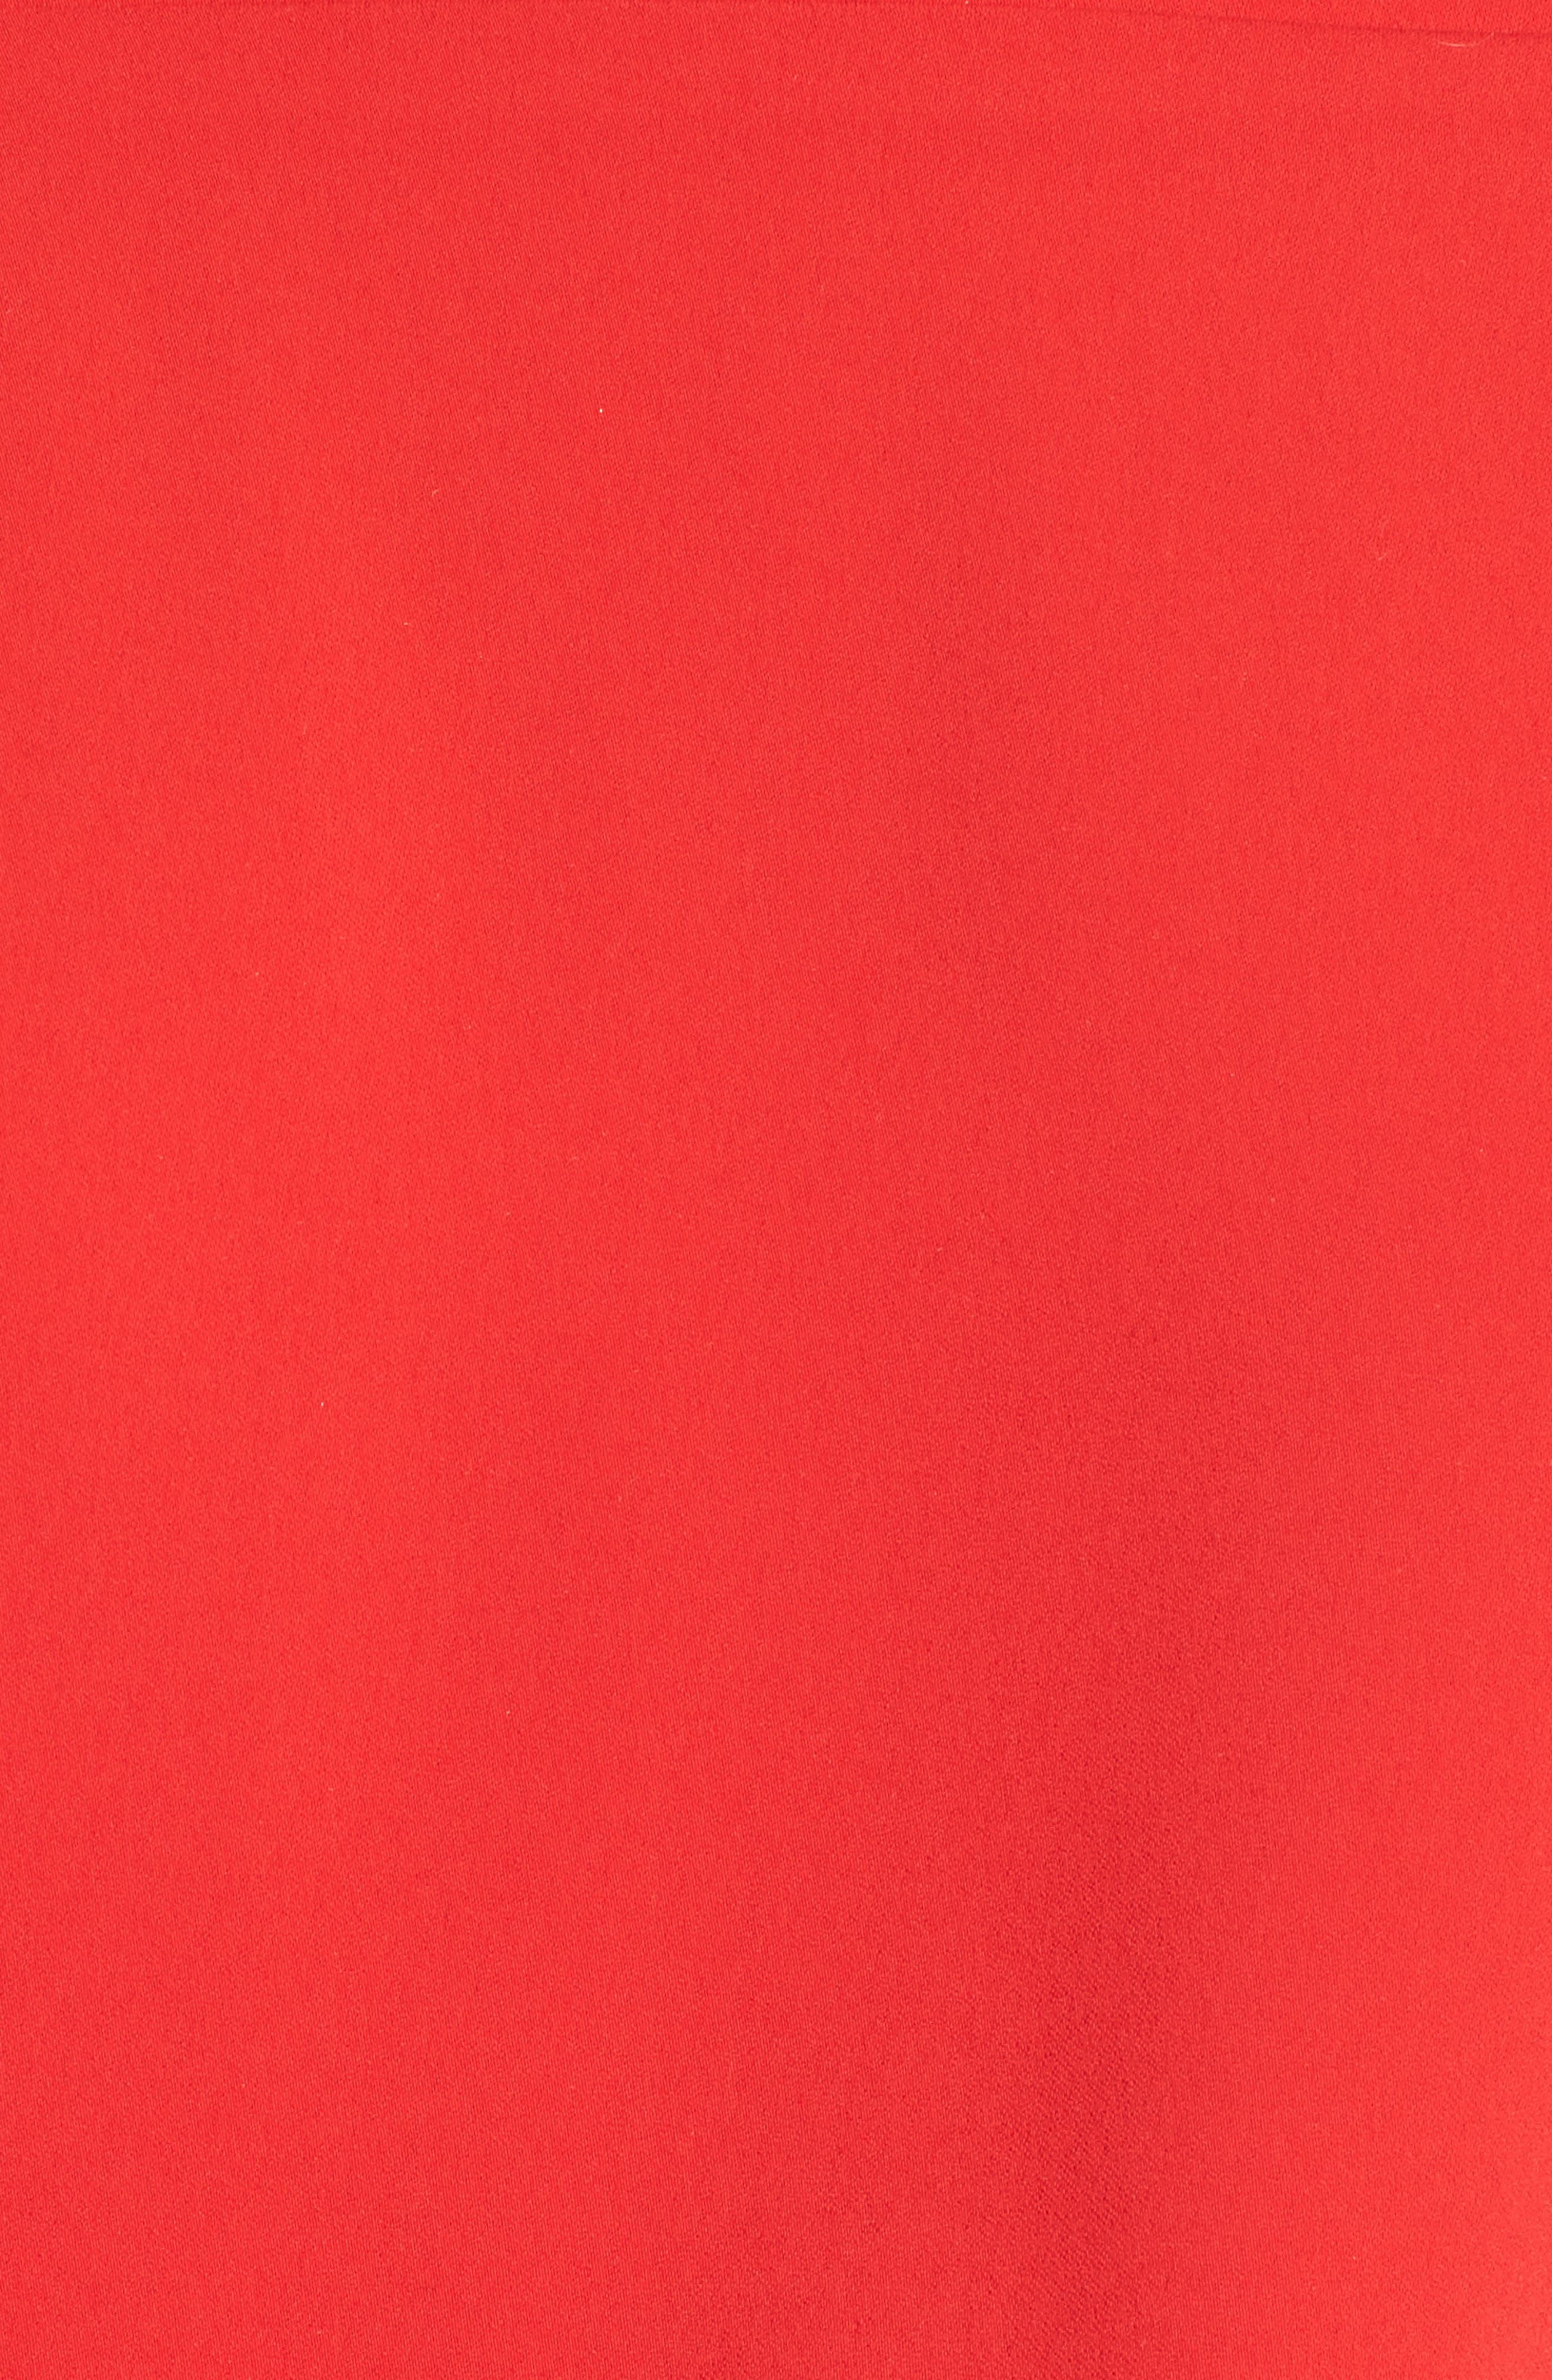 Elson Off the Shoulder Top,                             Alternate thumbnail 5, color,                             Formula One Red